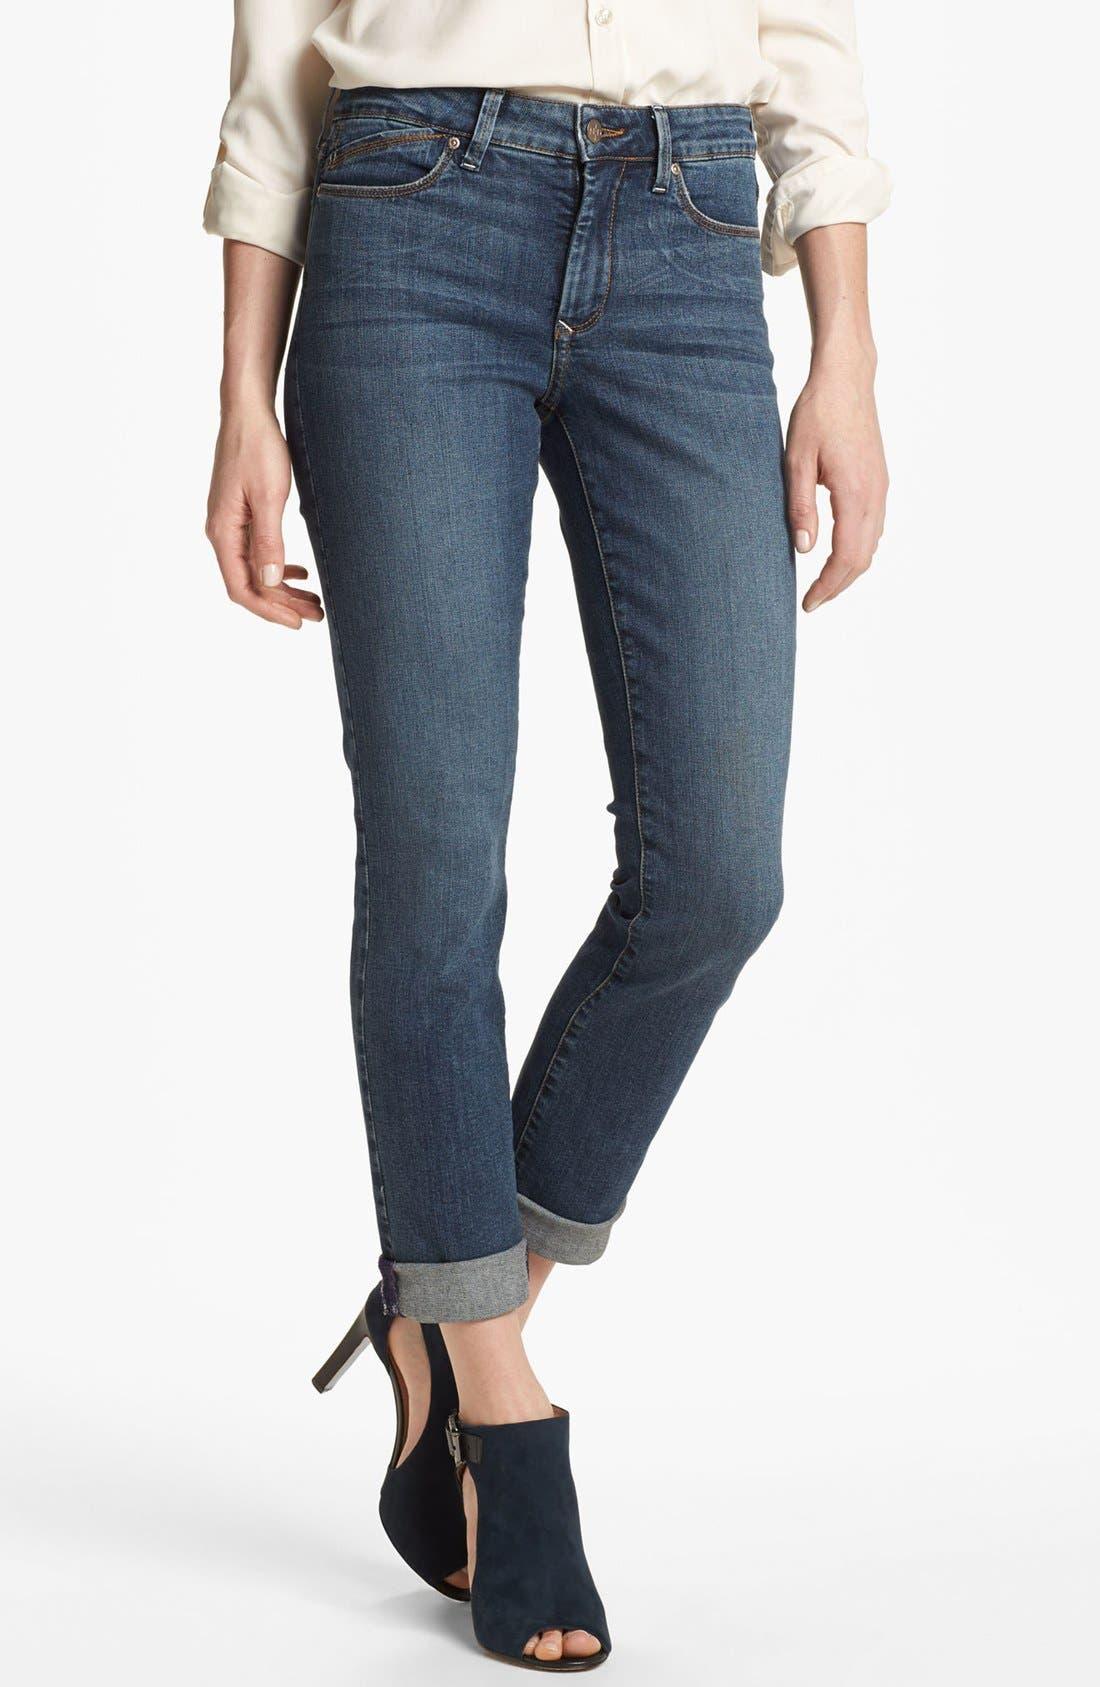 Main Image - NYDJ 'Leann' Stretch Skinny Boyfriend Jeans (Petite)